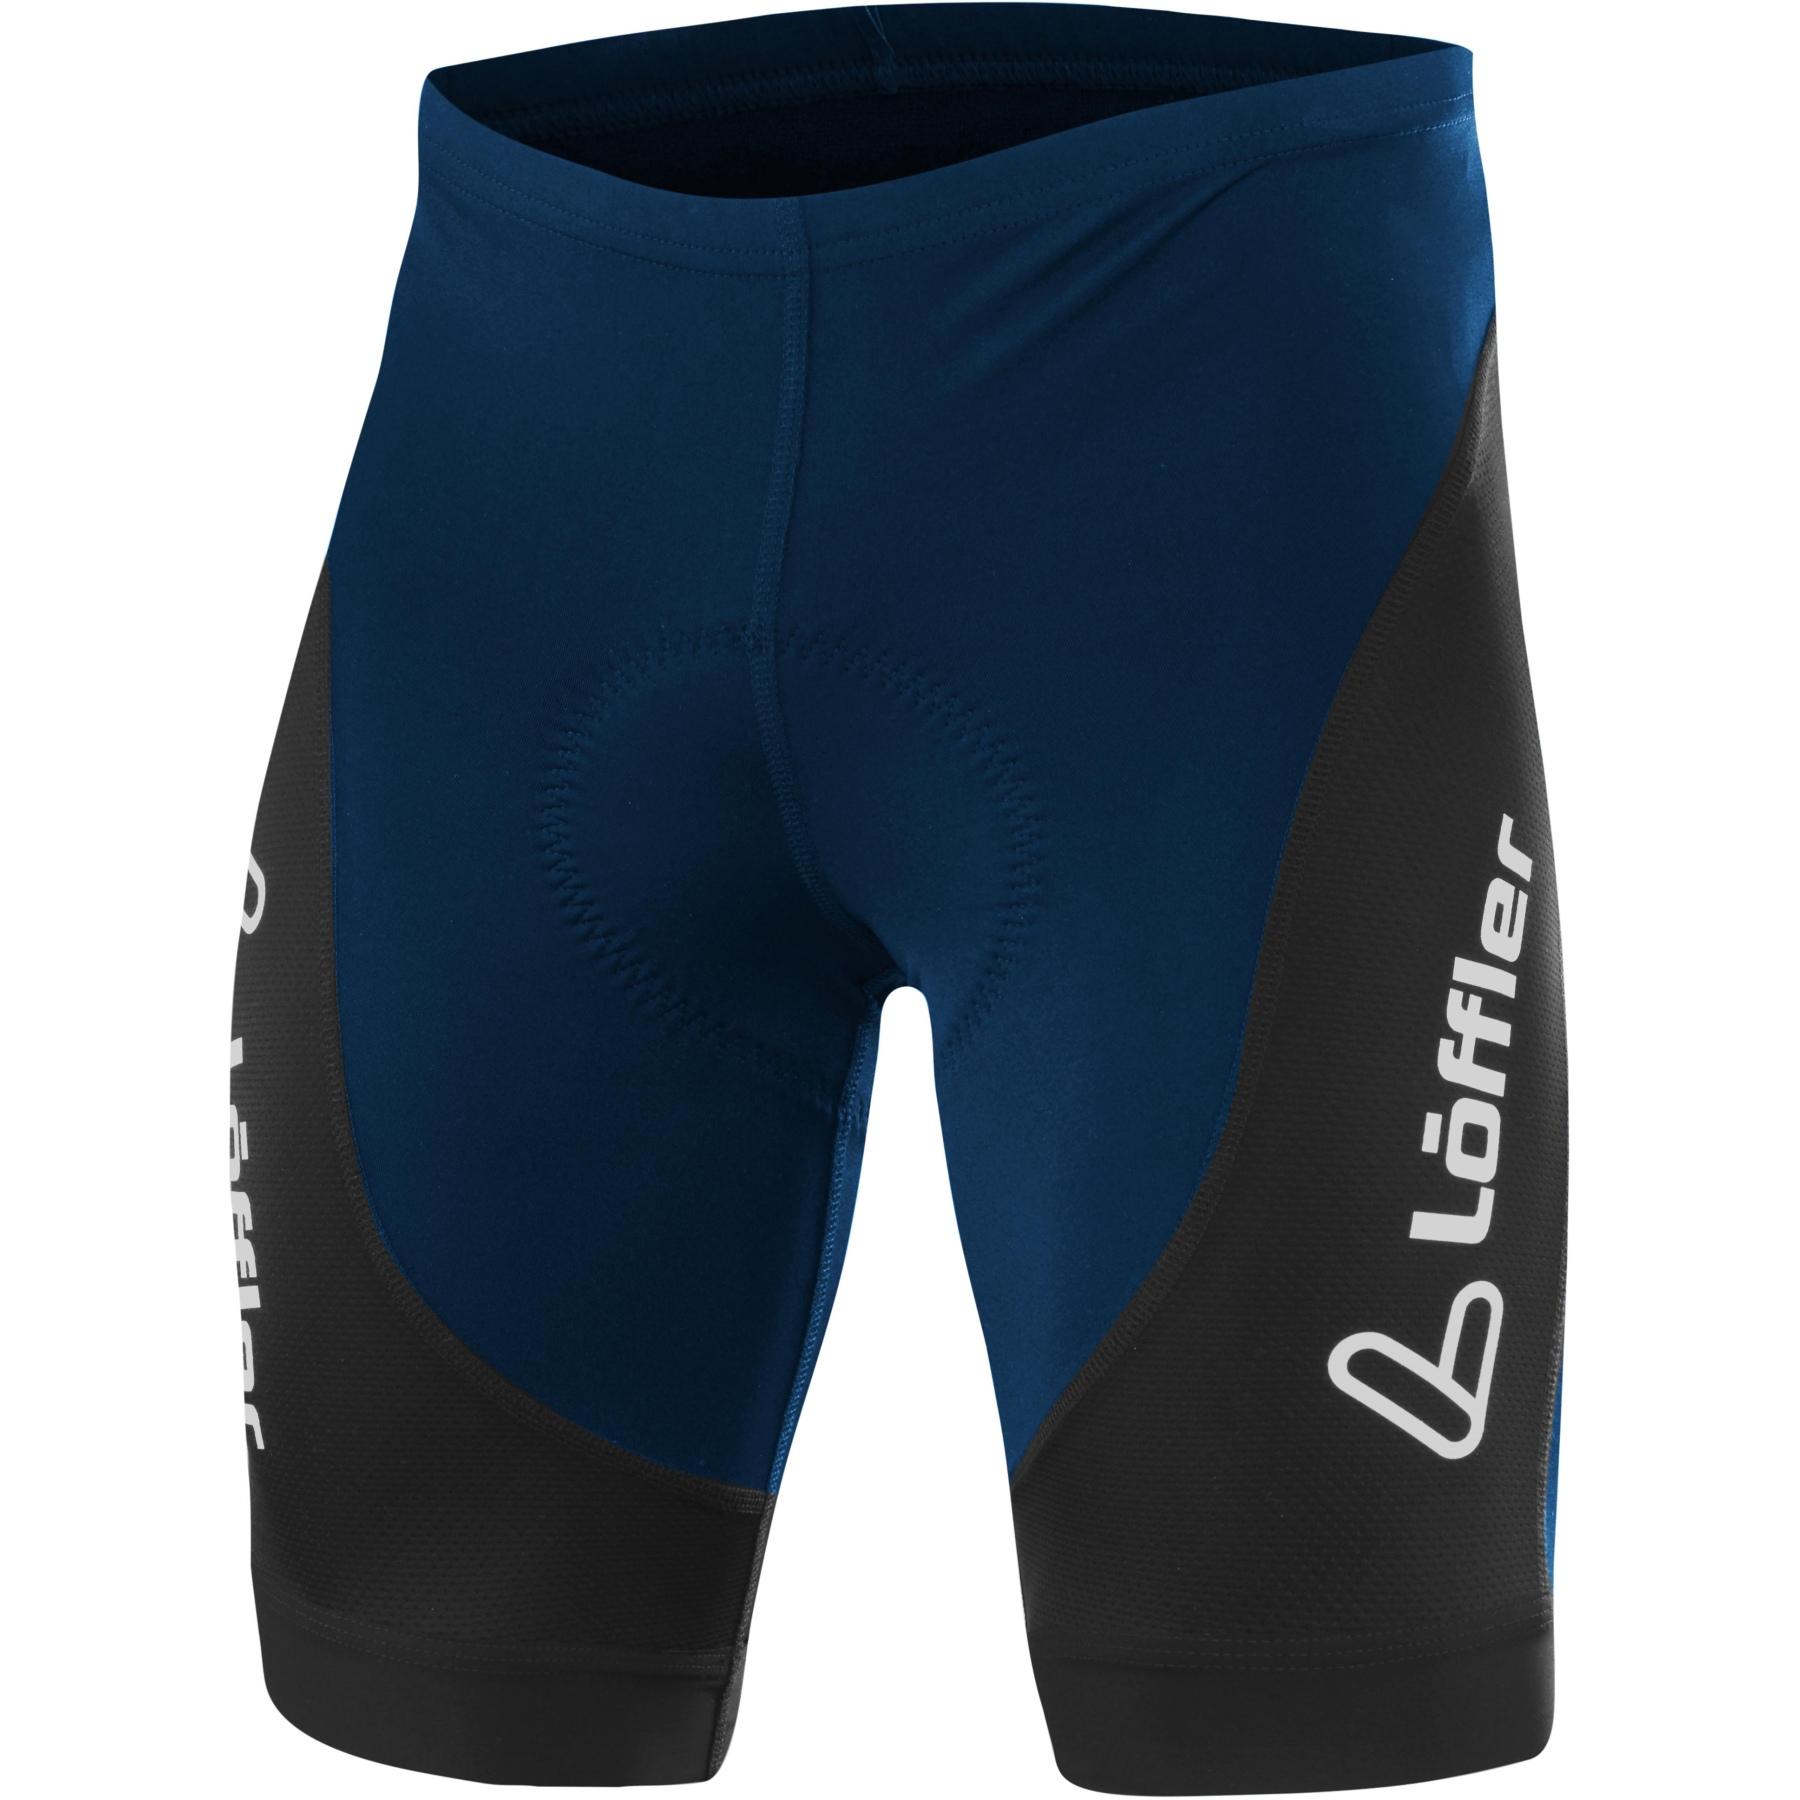 Löffler Bike Shorts Winner II 23910 - deep water 470